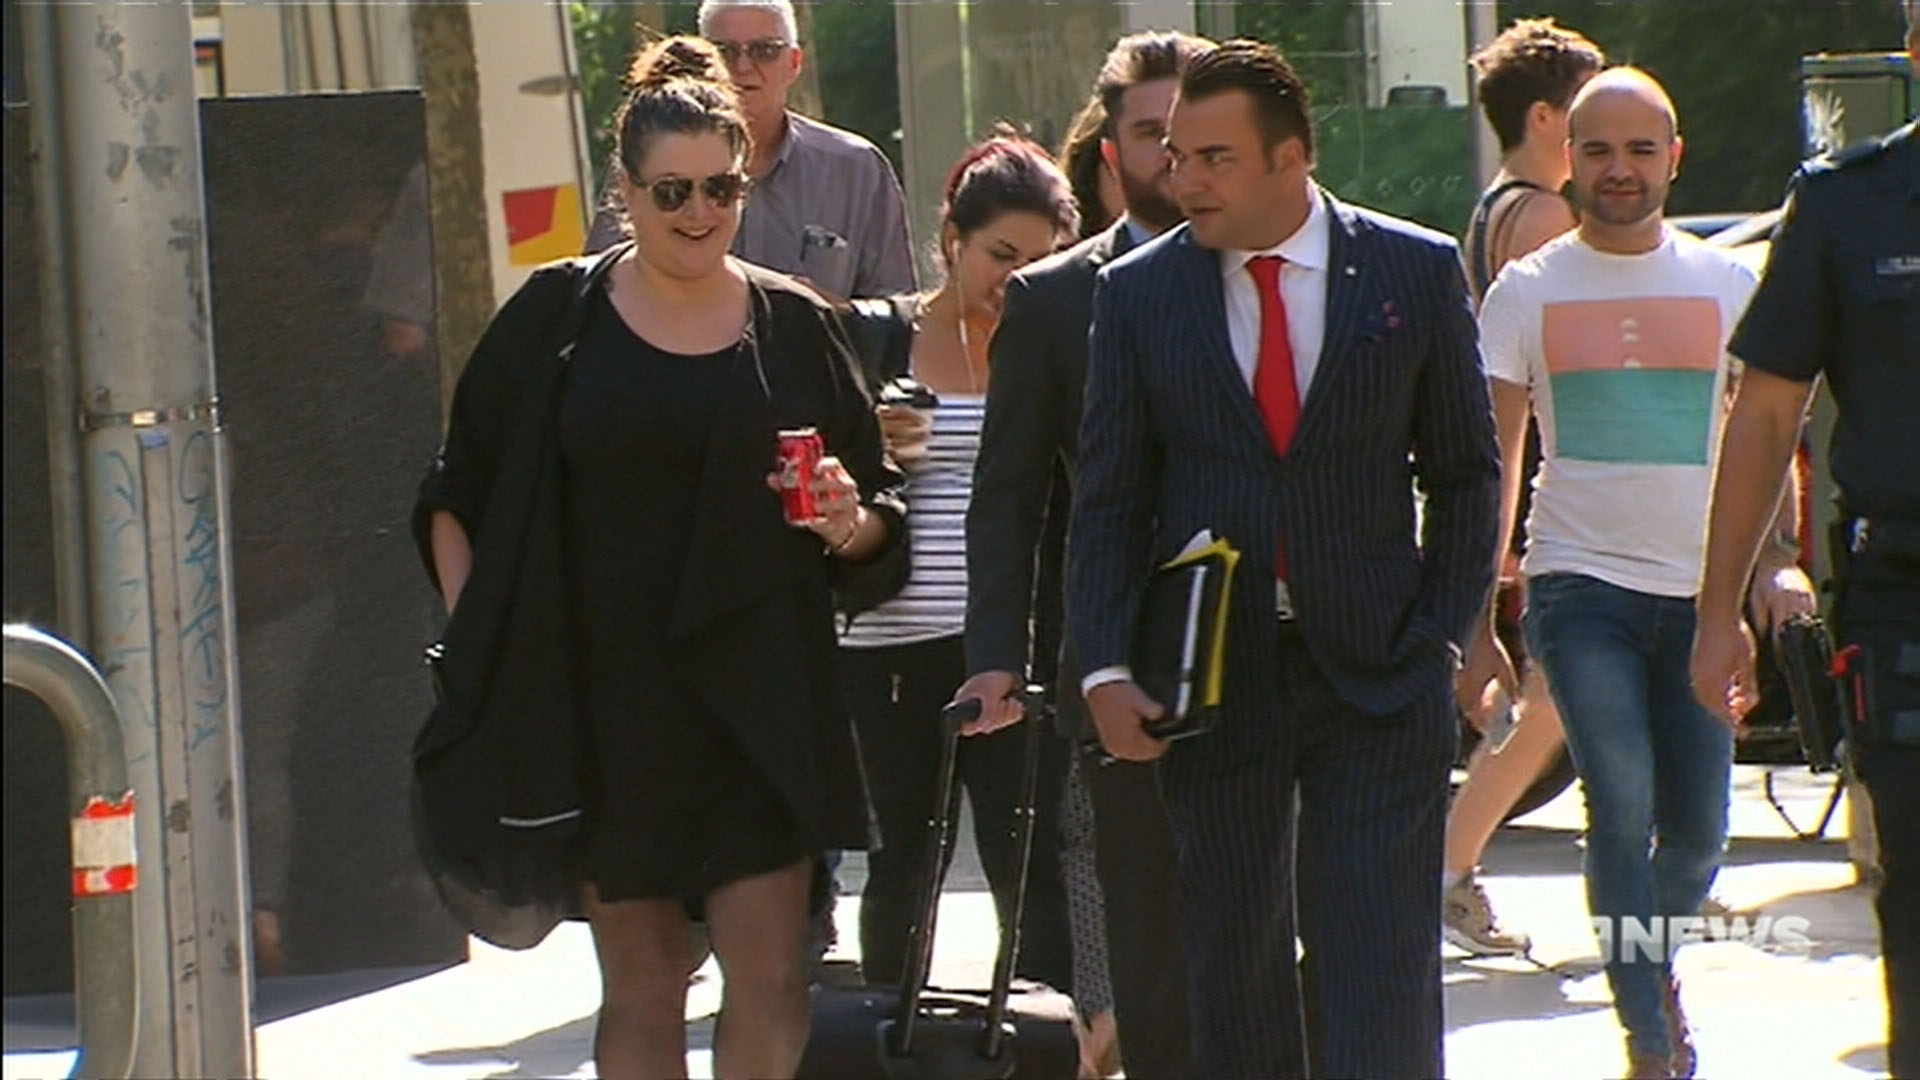 Tziporah Malkah pleads guilty to driving erratically